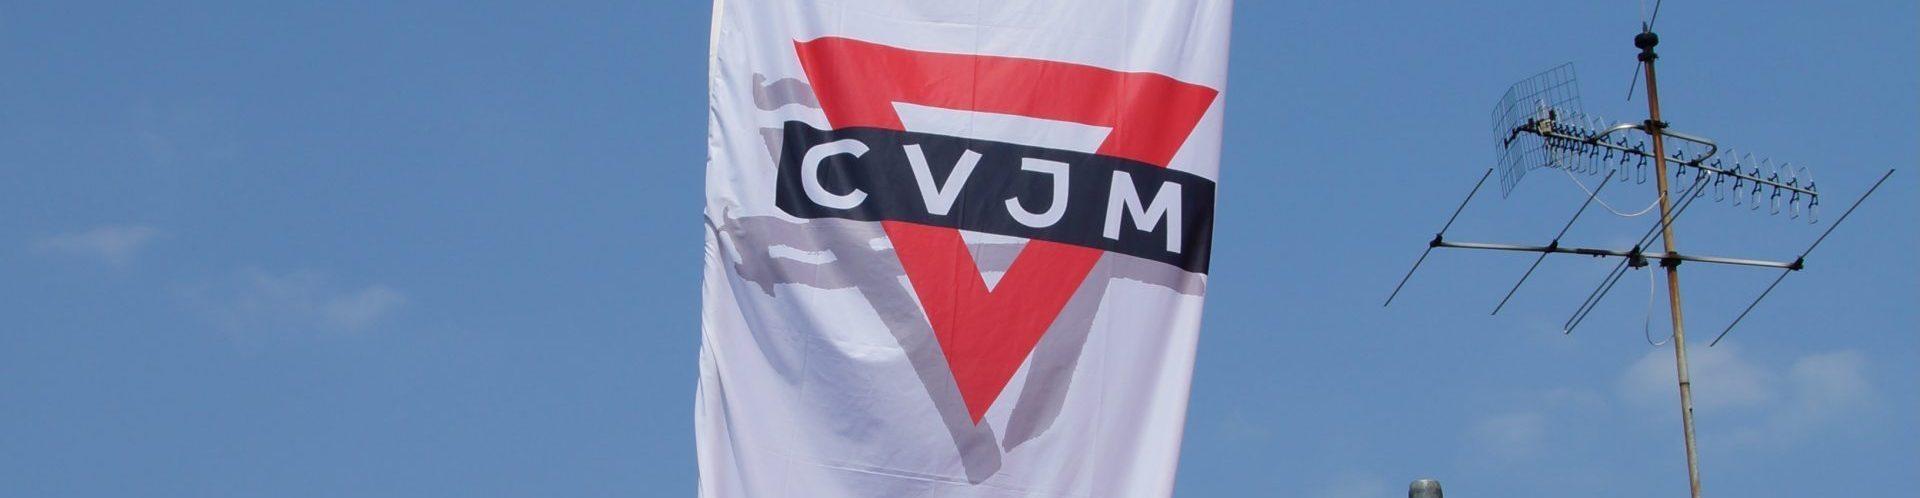 18.02.2017 Hauptversammlung des CVJM